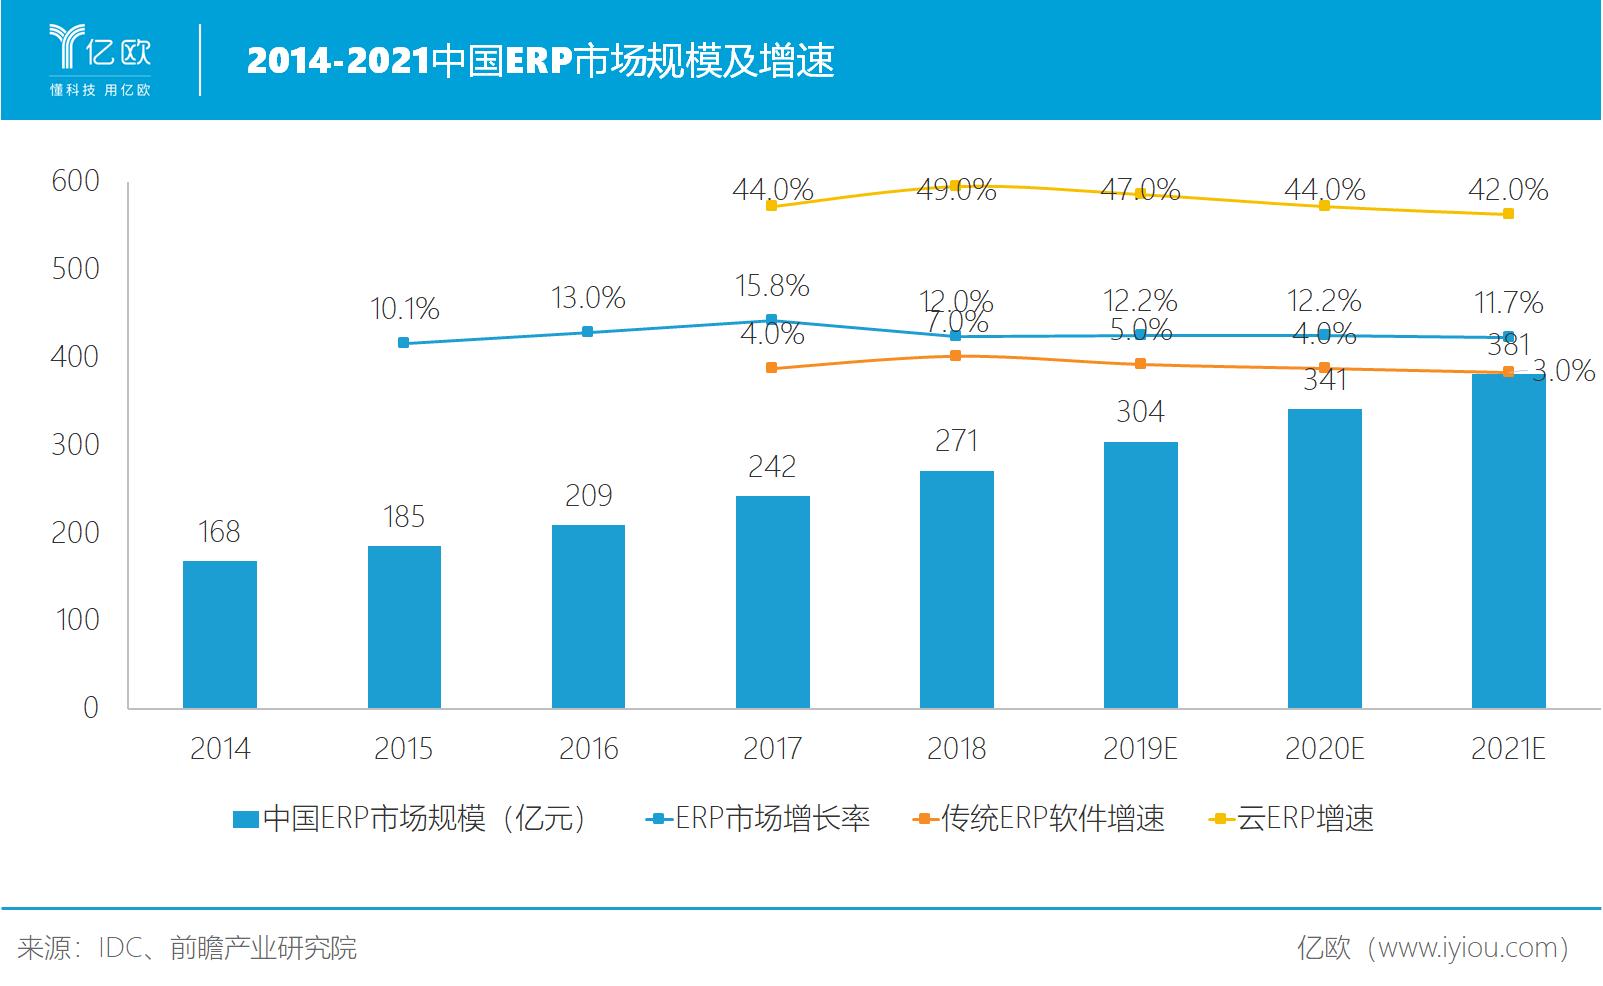 ERP市场规模及增速.png